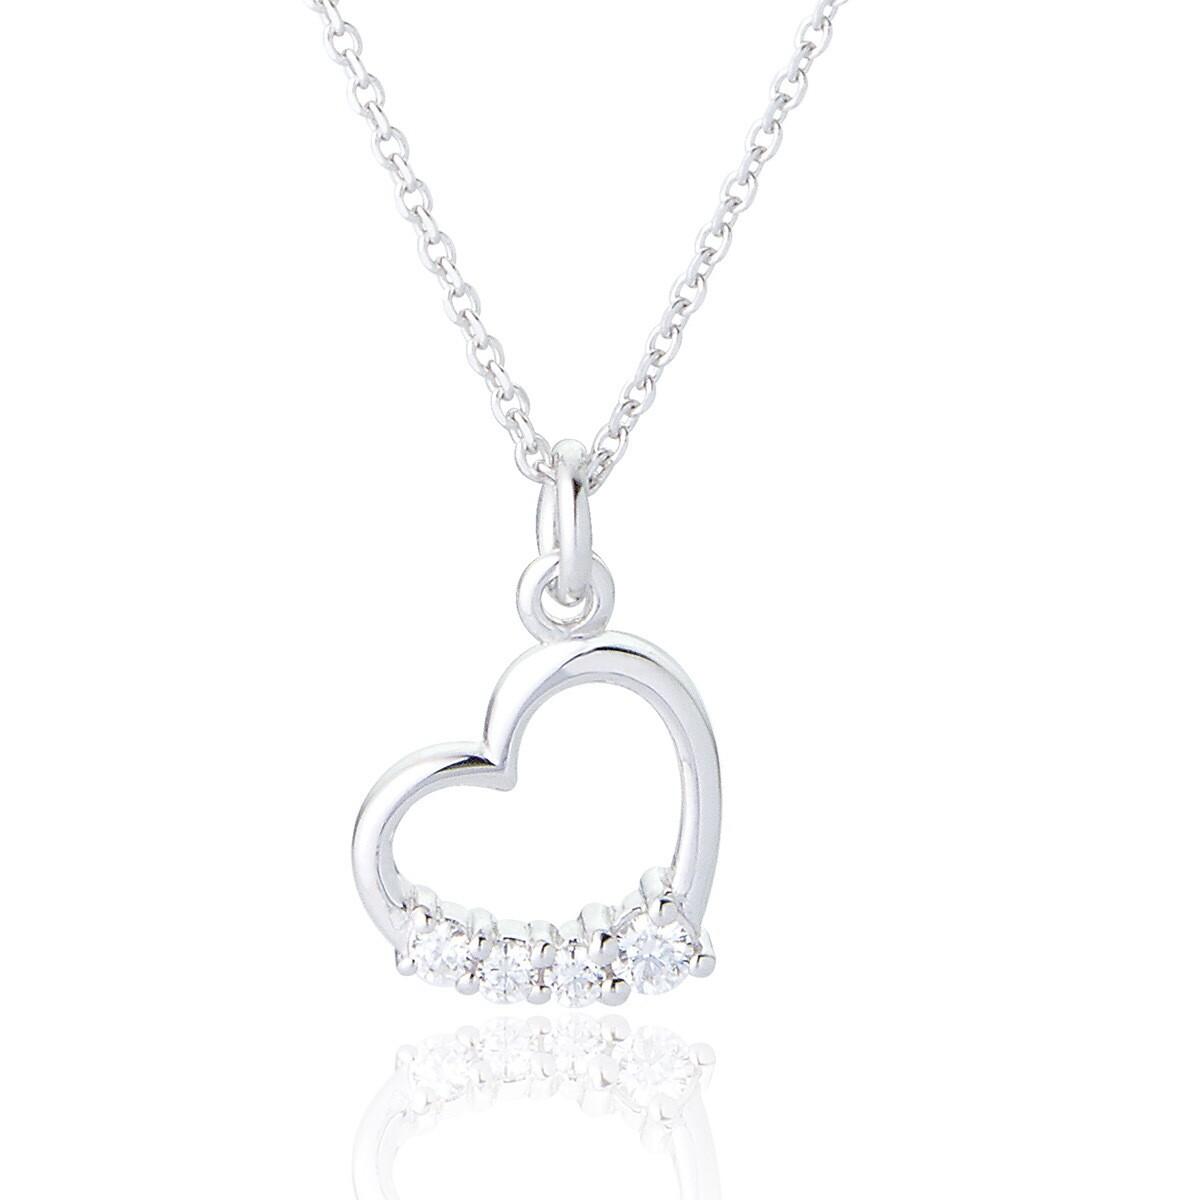 Ettie Heart Pendant & Chain